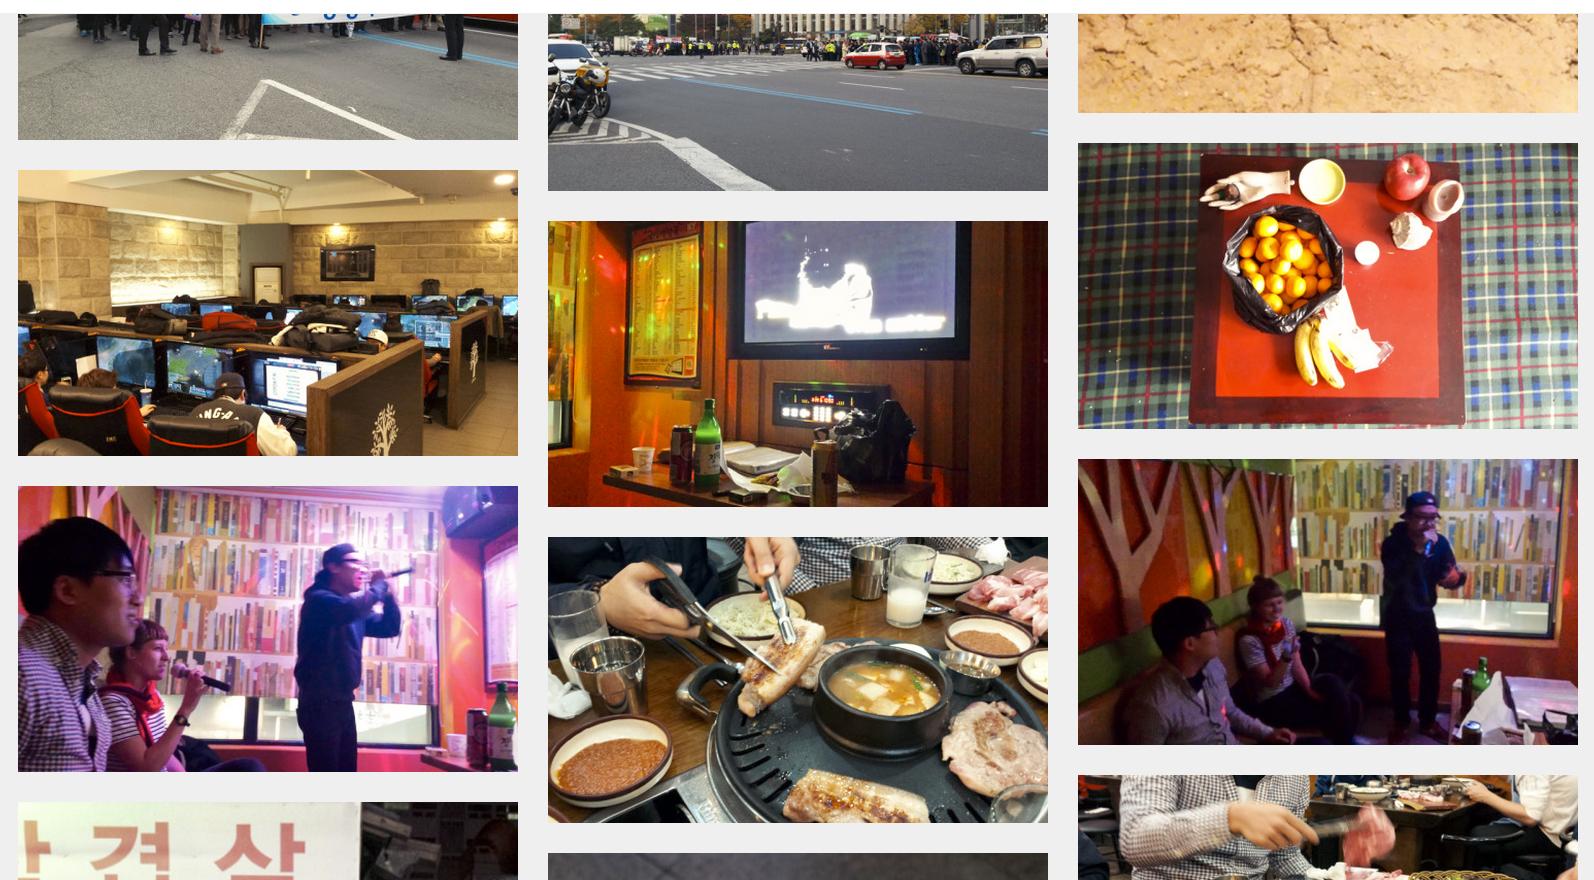 Karaoke, living room creepers, gaming cafes.